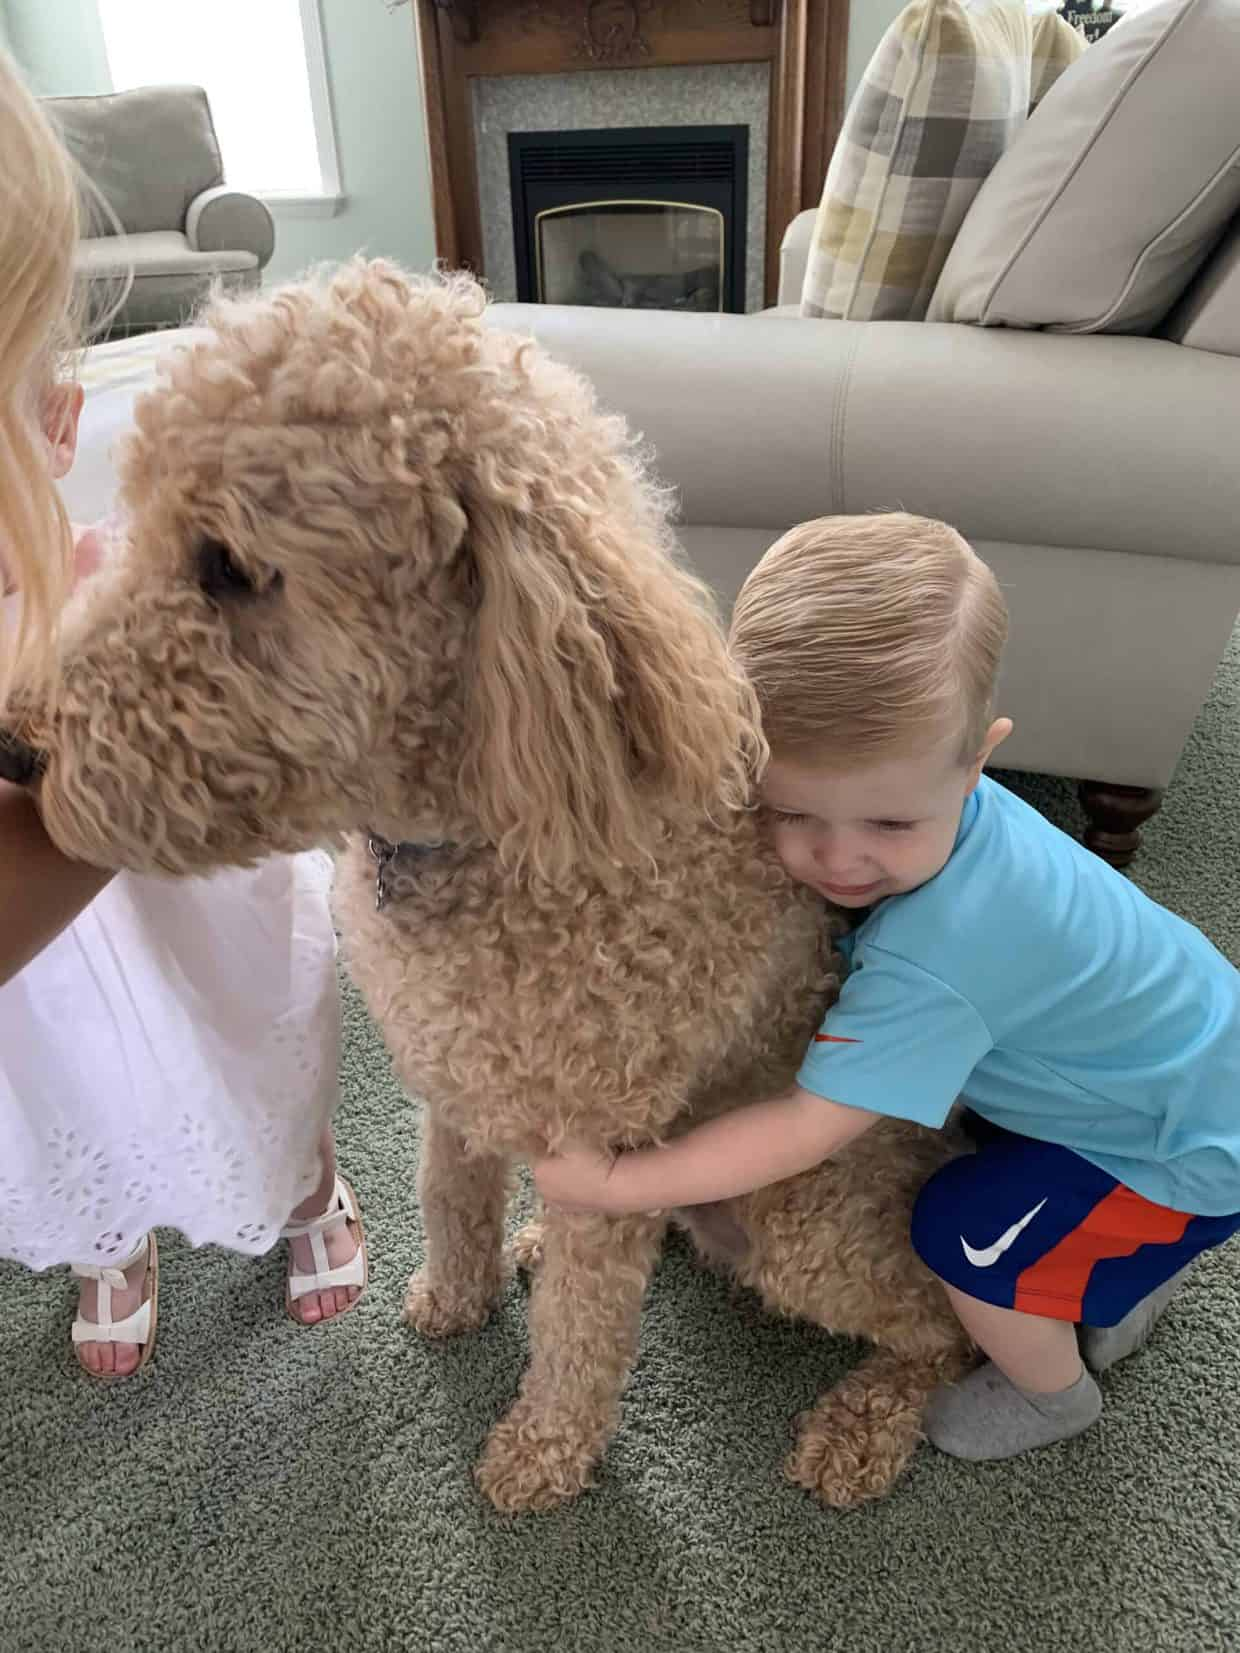 A young boy hugging a dog.